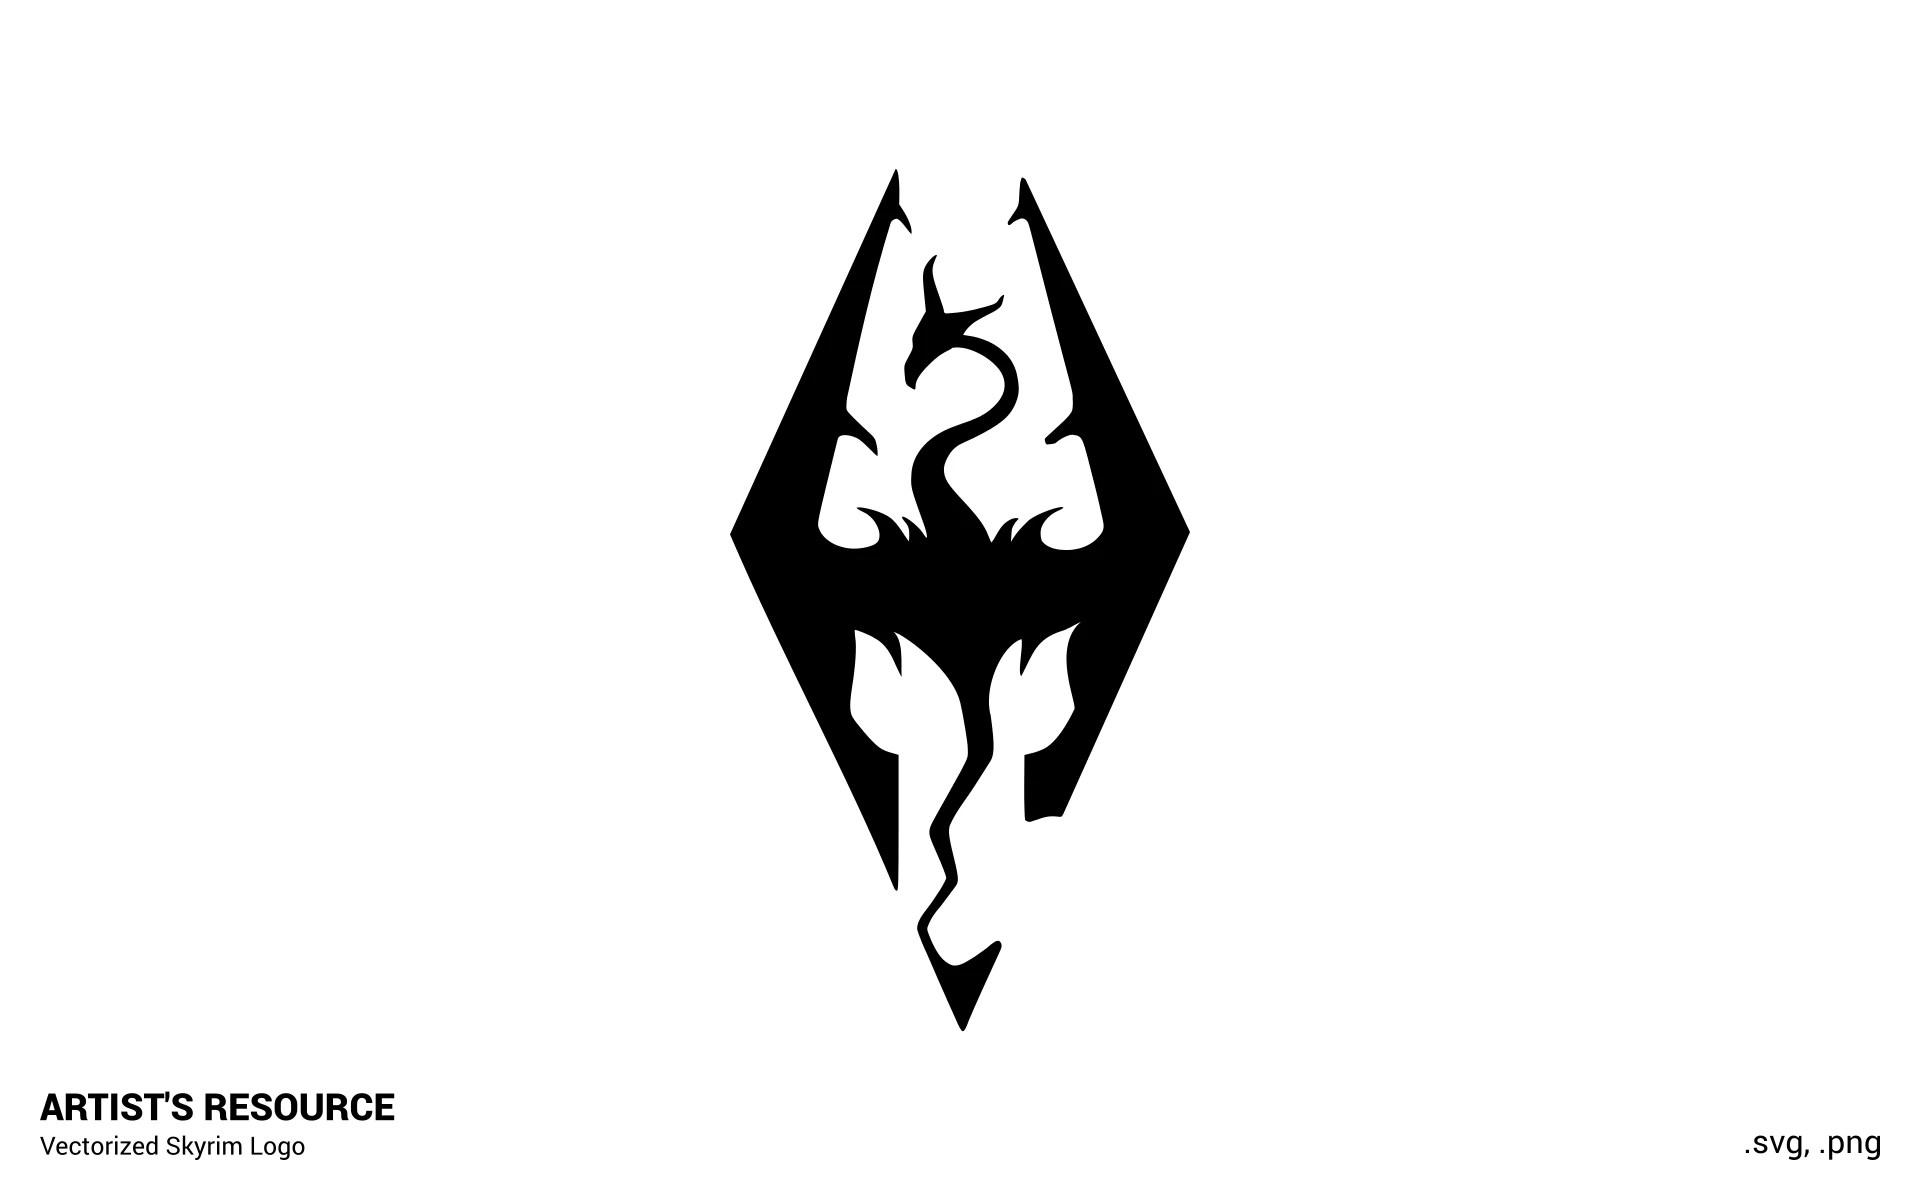 Black Ops Wallpaper Hd Skyrim Logo Vector Svg And High Res Png At Skyrim Nexus